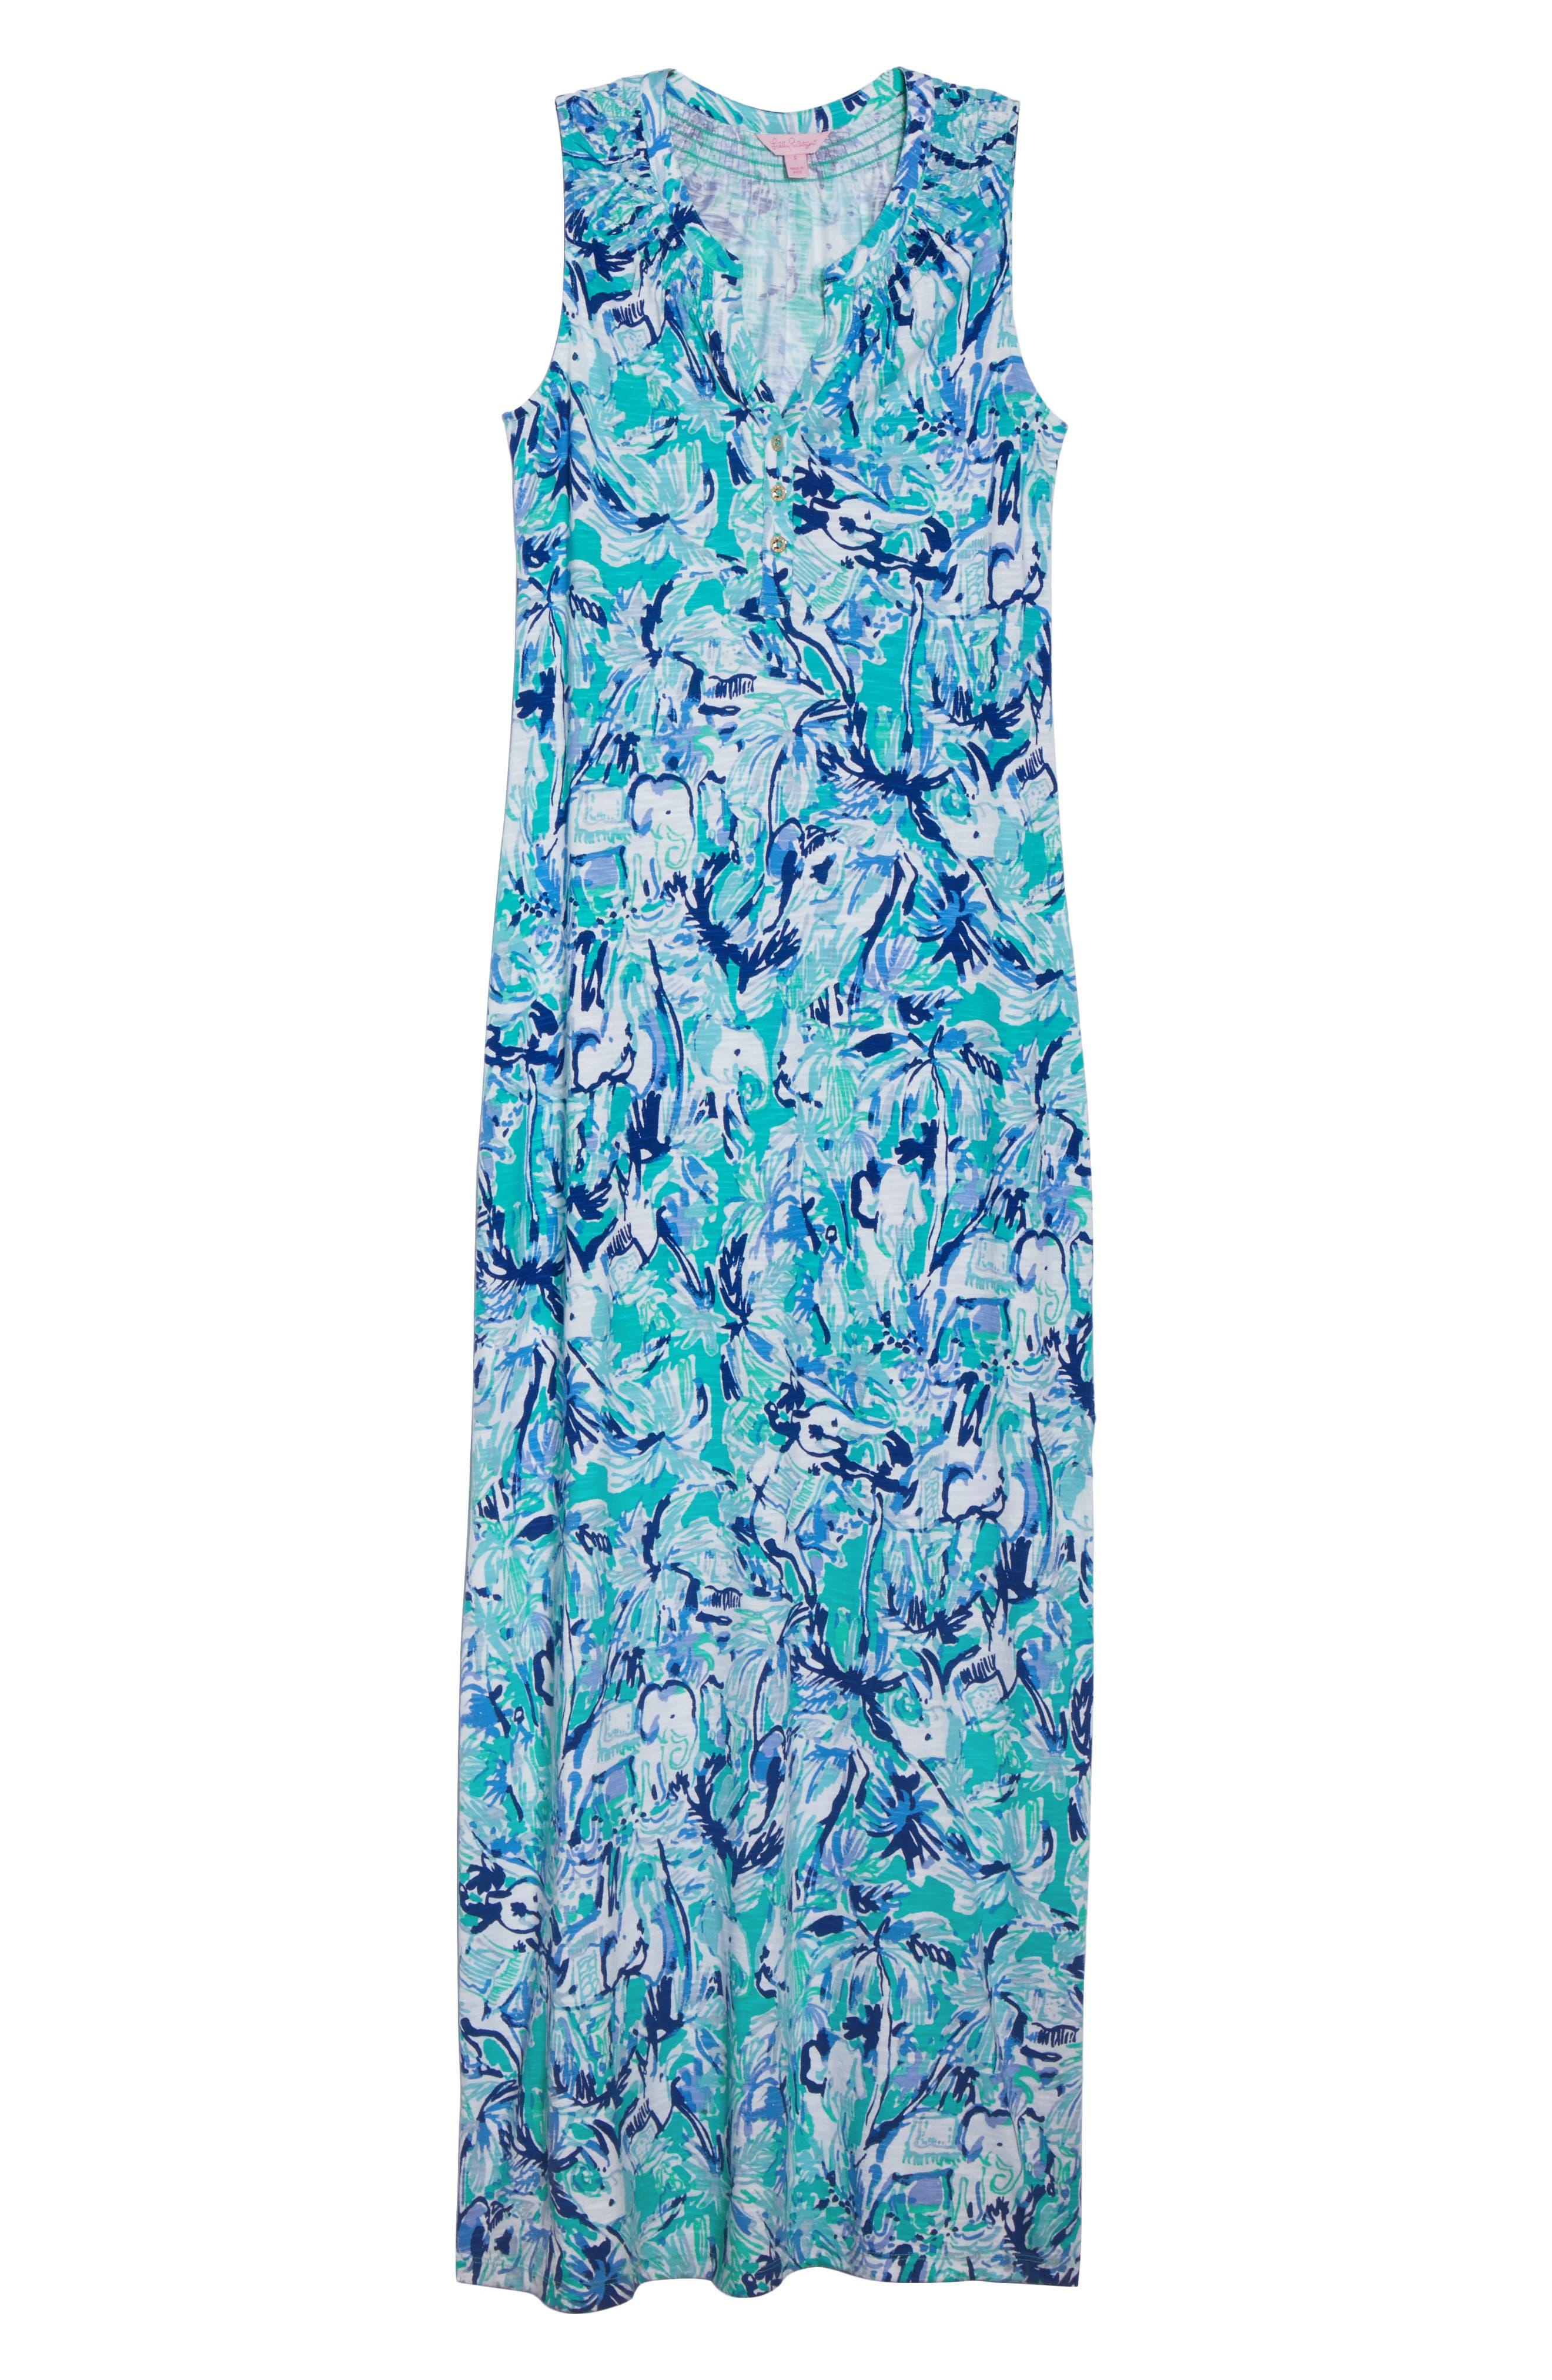 Essie Maxi Dress,                             Alternate thumbnail 7, color,                             421